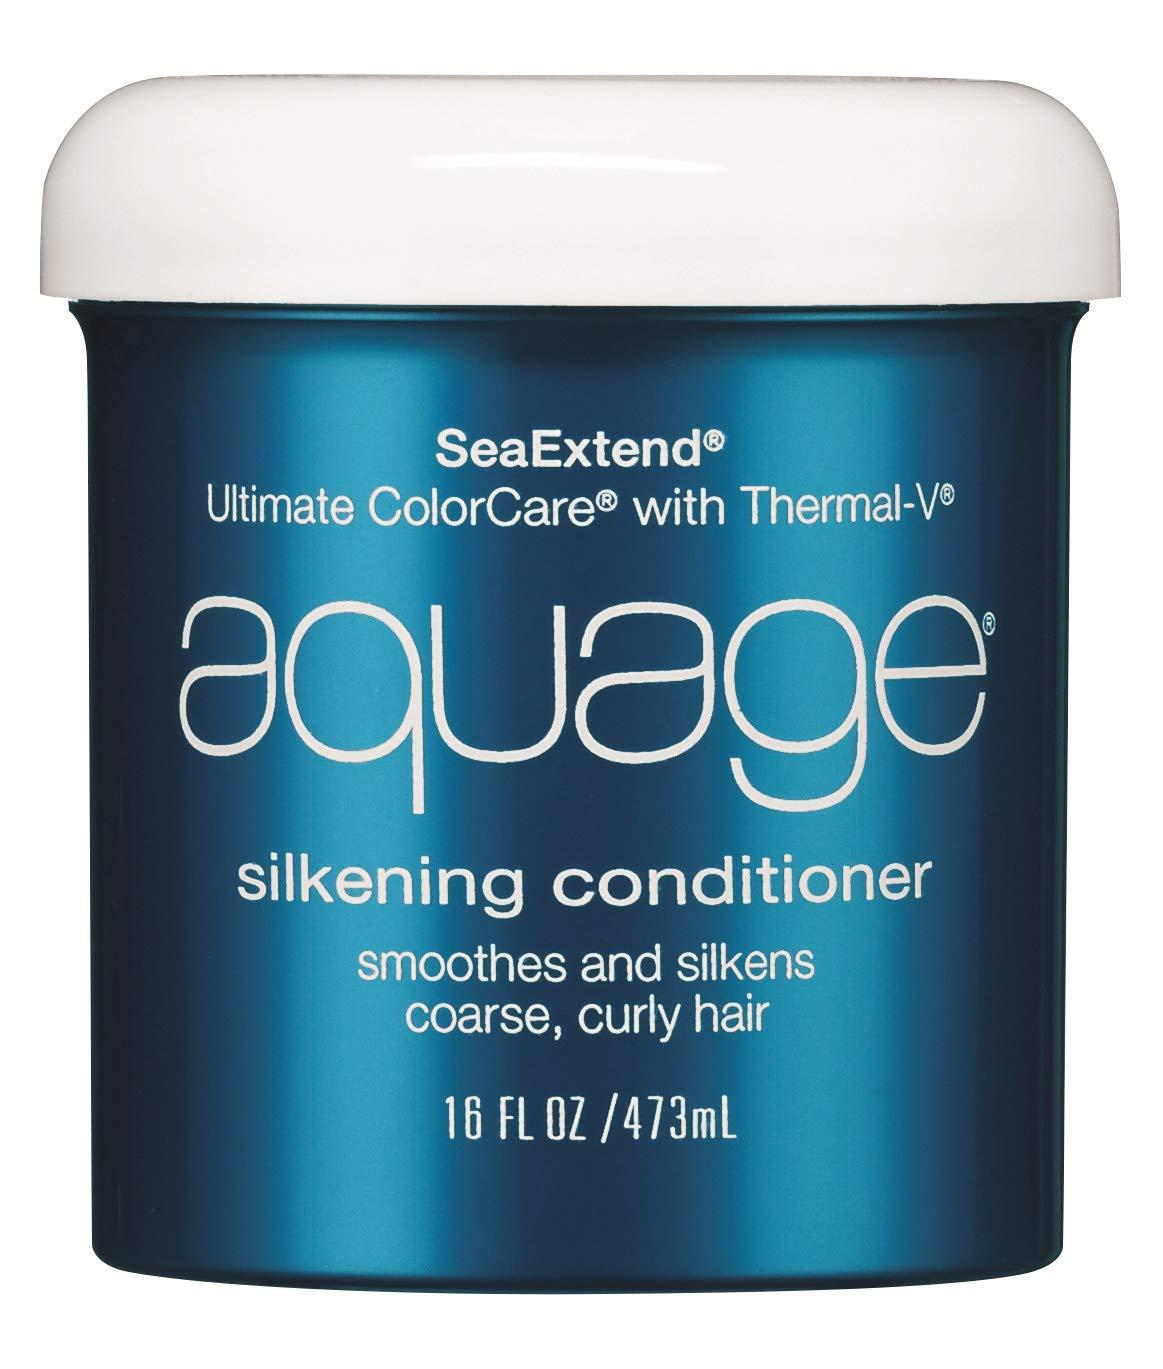 AQUAGE Silkening Detroit Mall Conditioner 16 oz. Luxurious Provides Elegant Co Dual